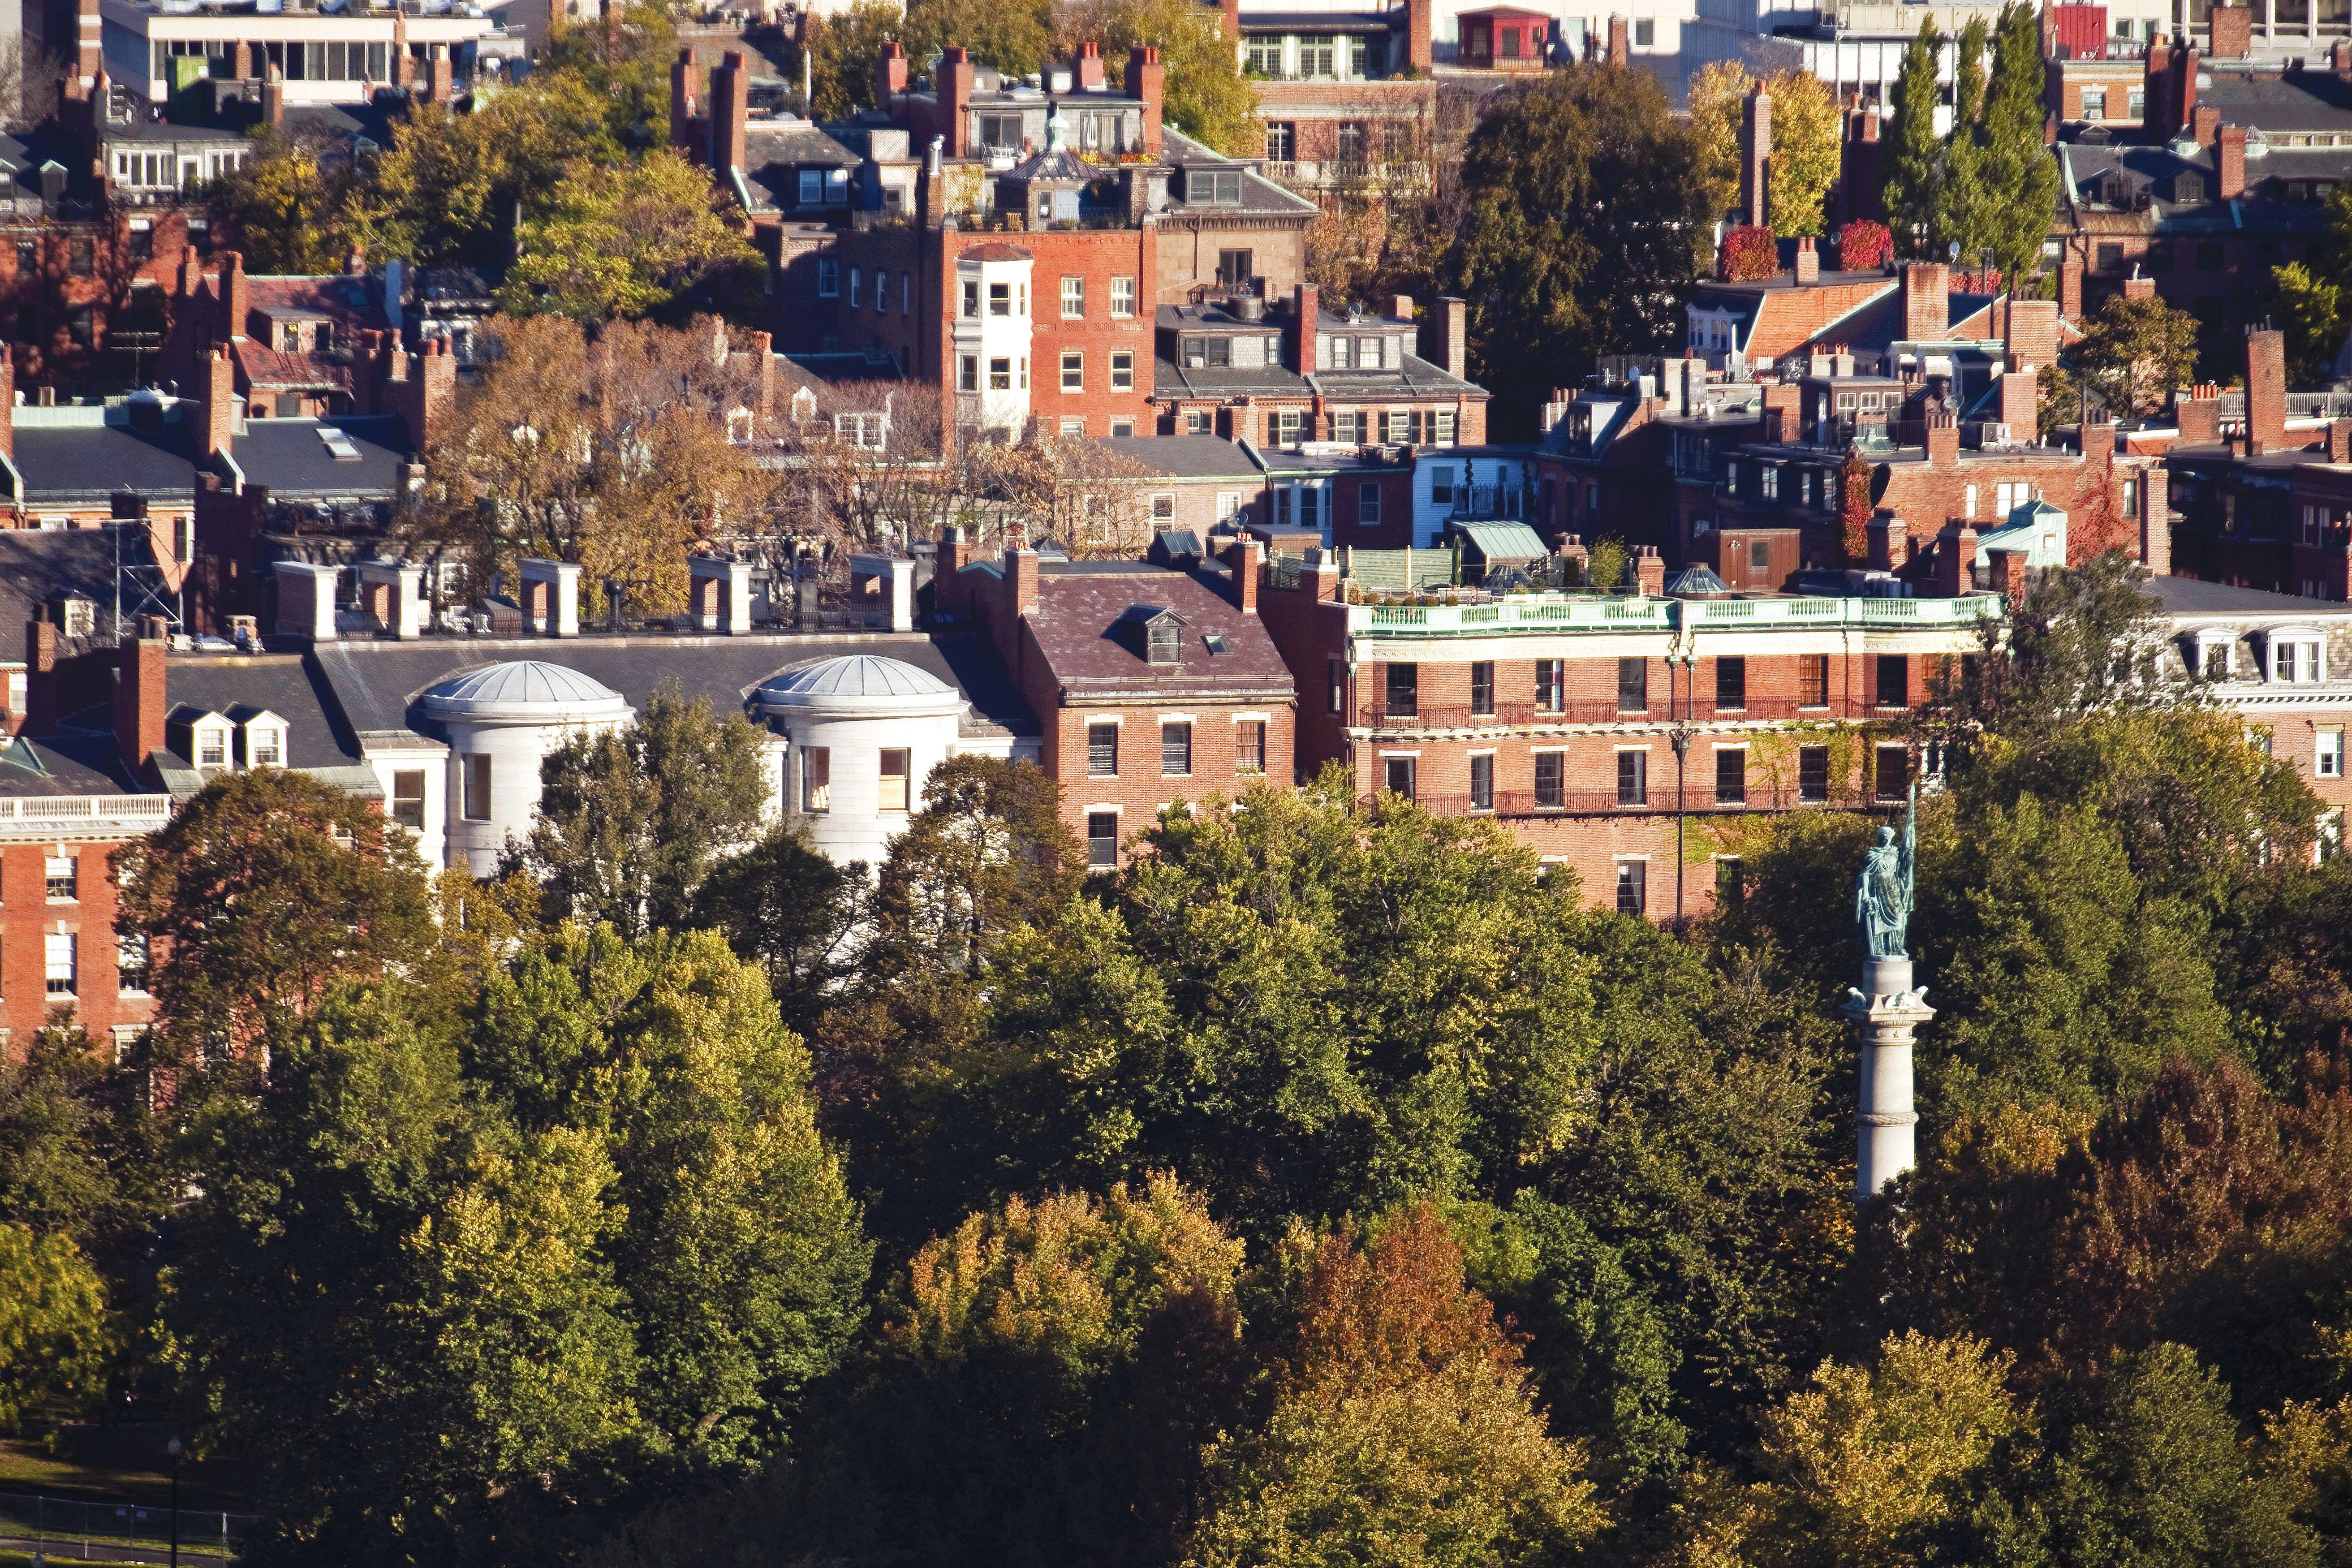 O bairro dos sonhos Beacon Hill, em Boston